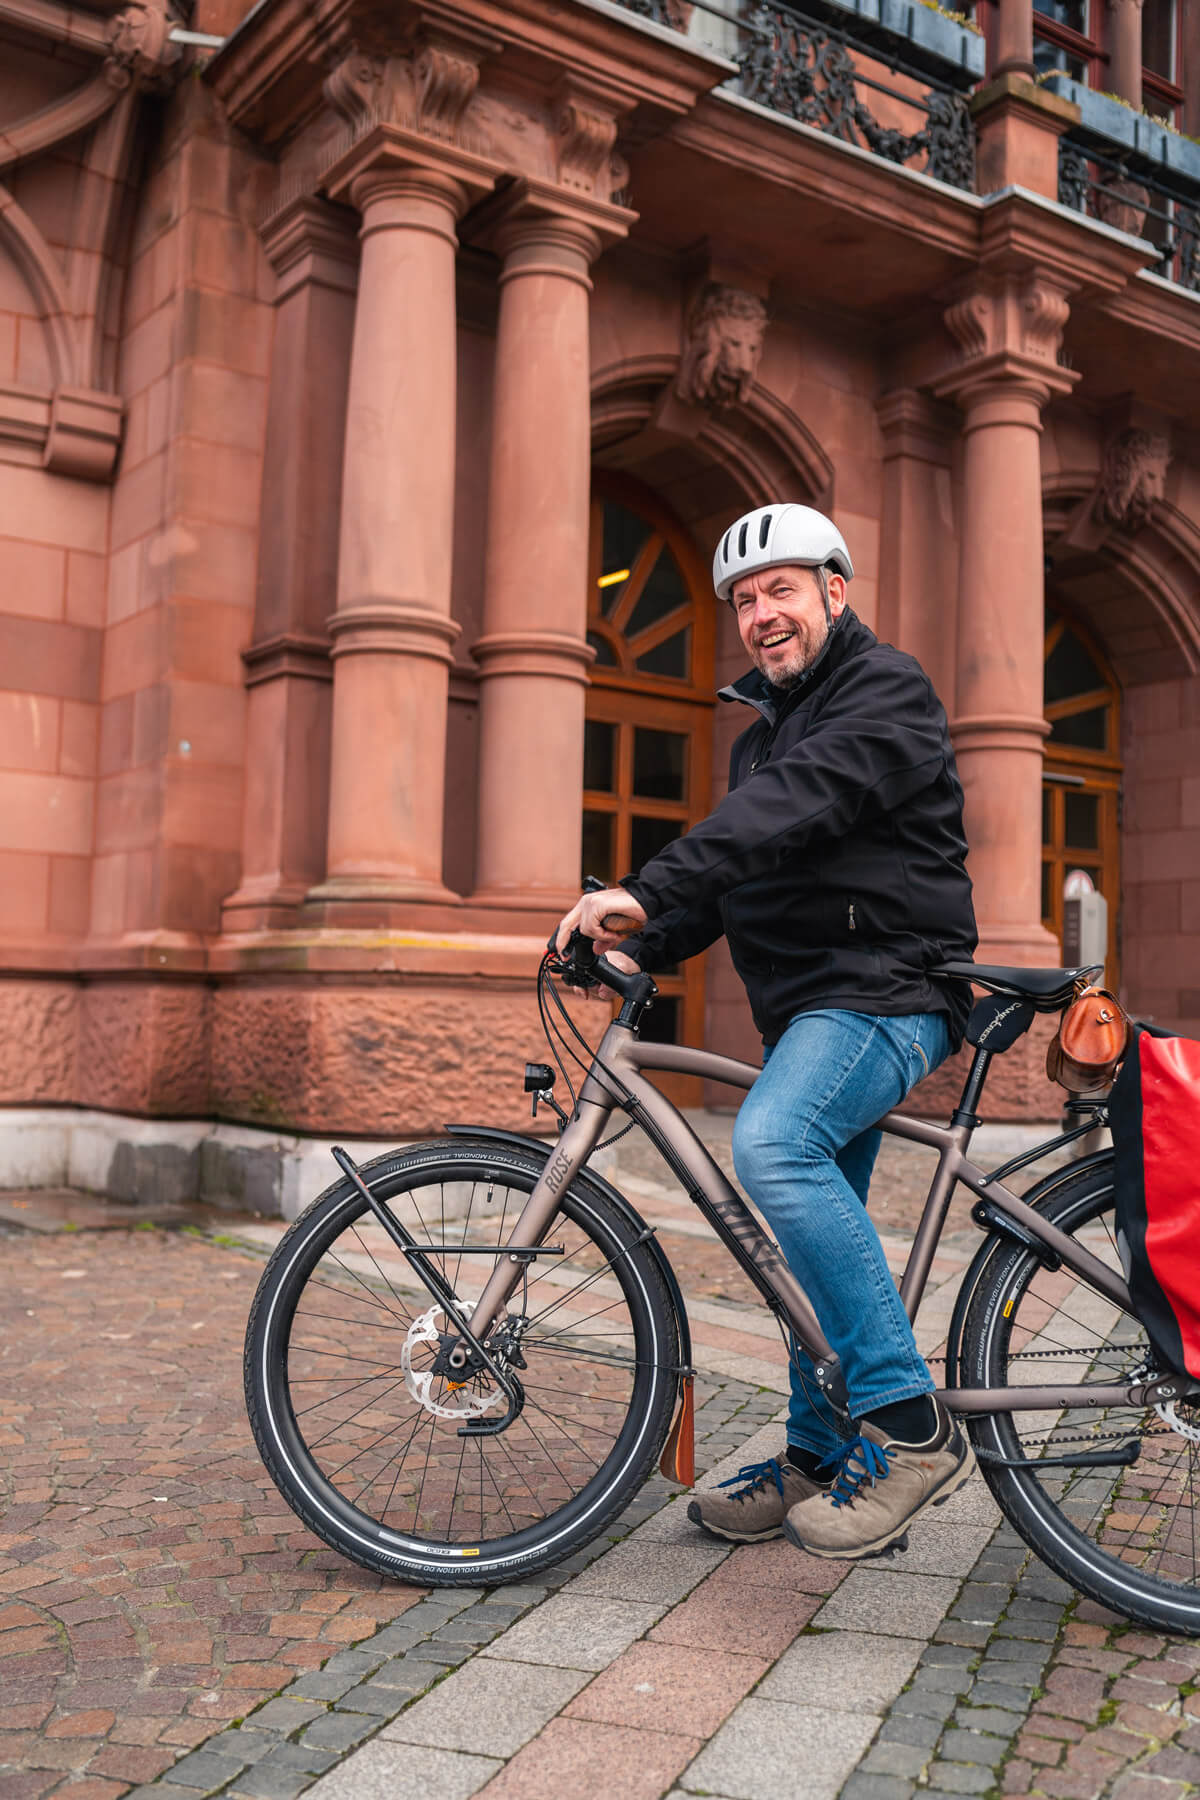 UmsteiGERN Botschafter Daniel auf seinem Fahrrad vor dem Dortmunder Standesamt